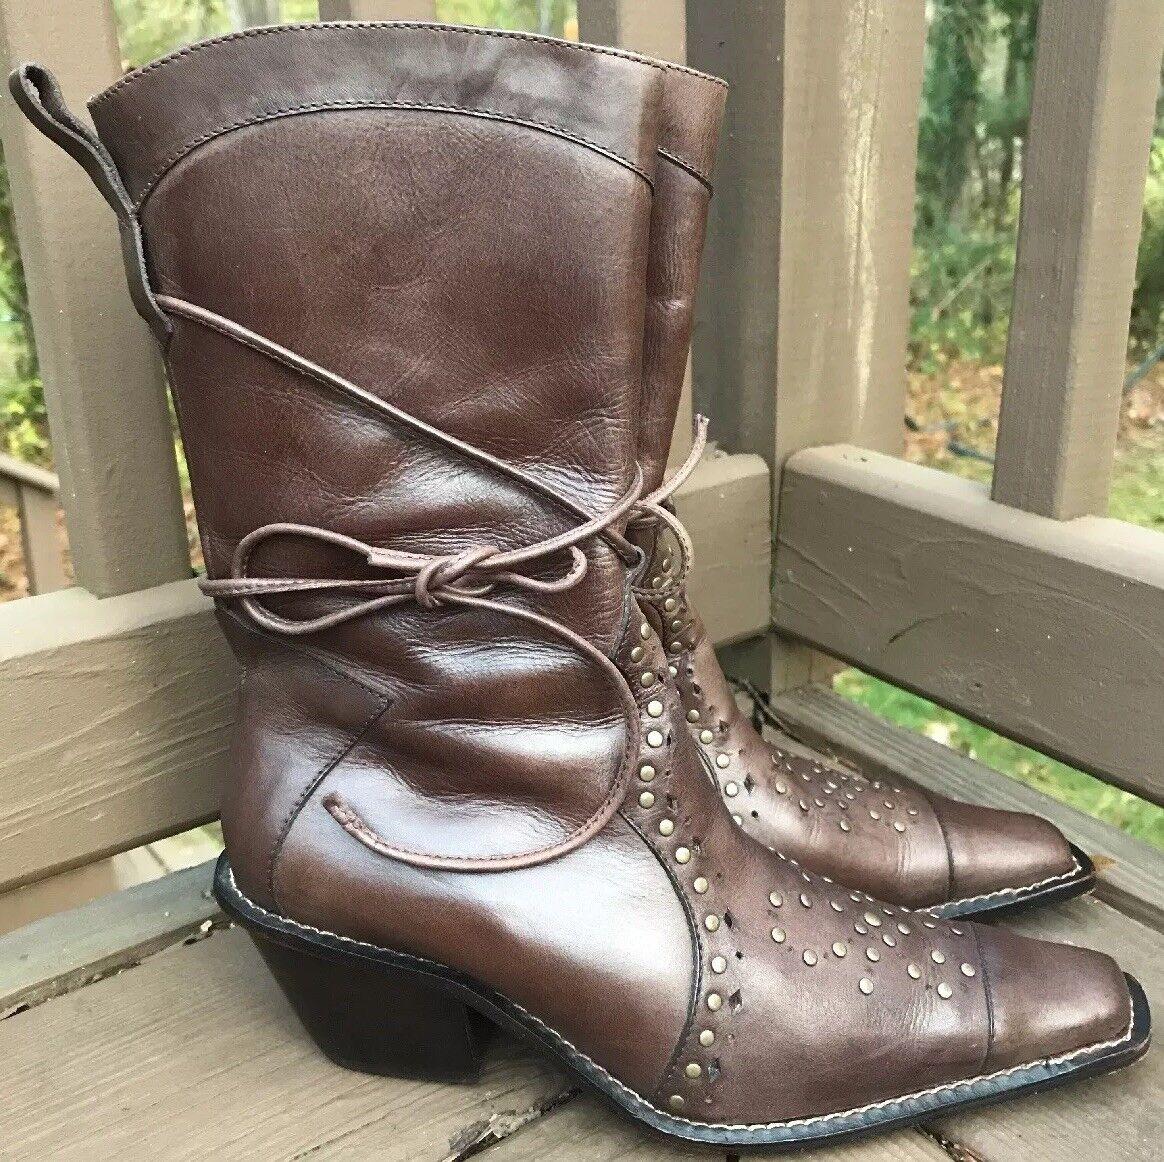 Wm VELEZ Western Midcalf Brown Leather Snip Toe Boot Sz 36 6-6.5M Studded